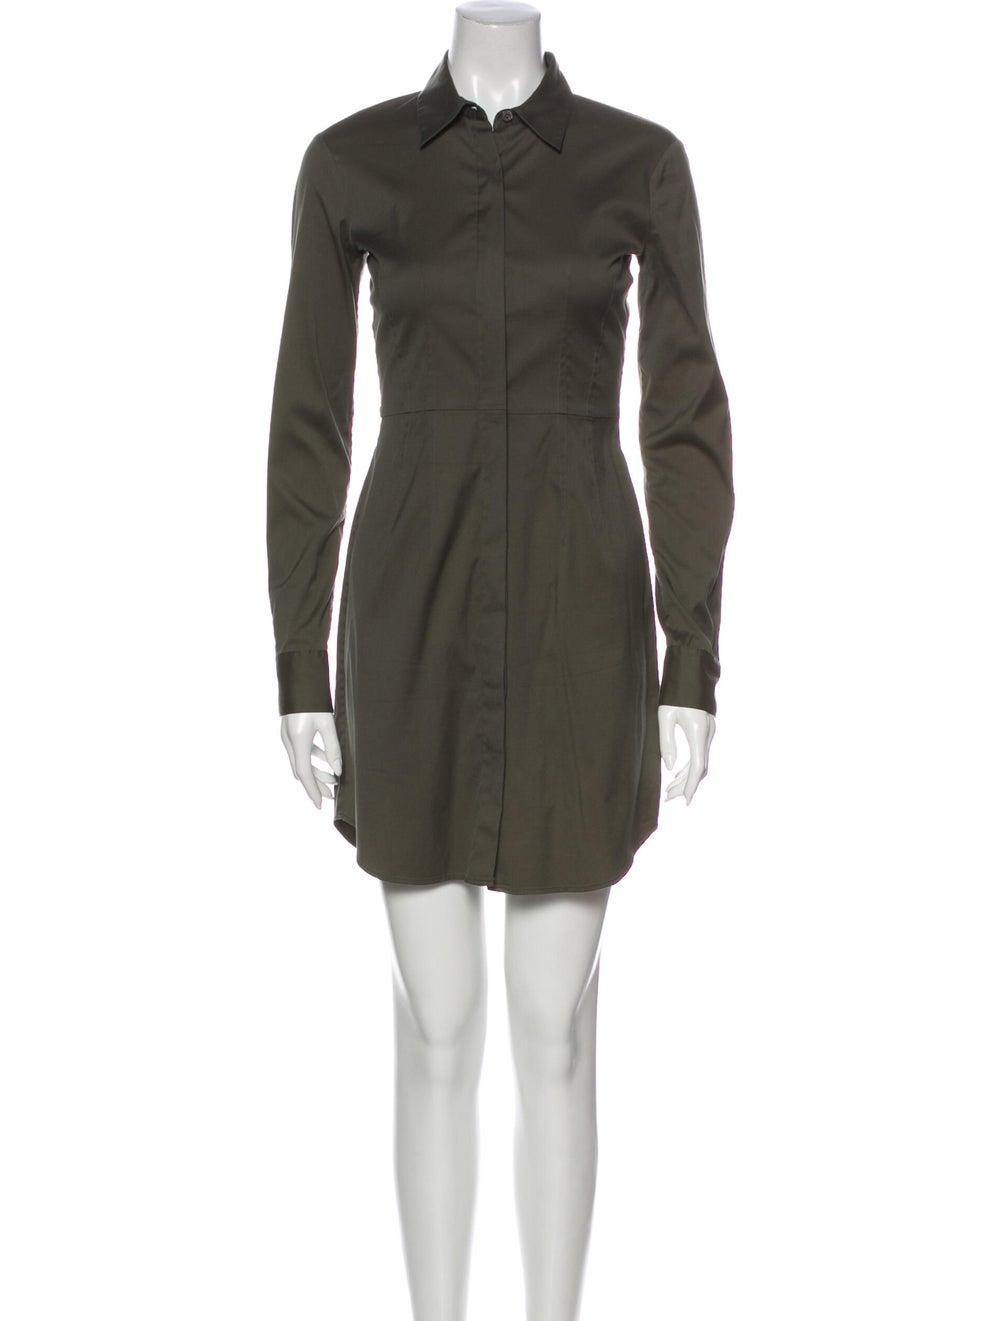 Theory Mini Dress Green - image 1